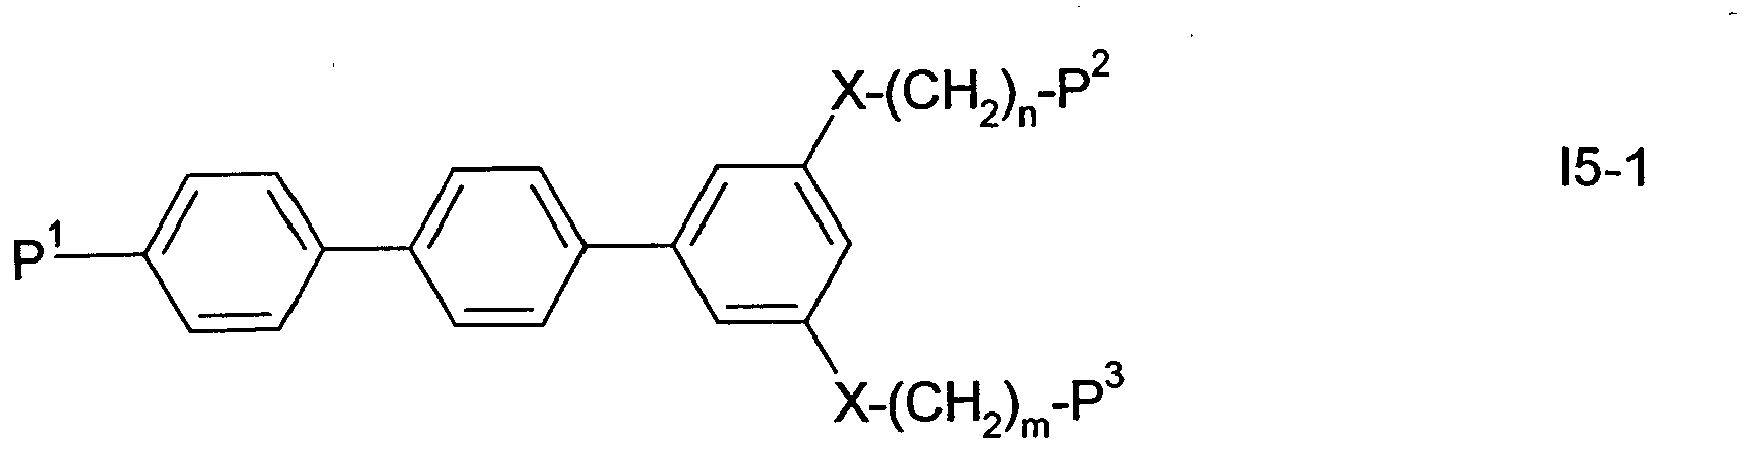 Figure imgb0732